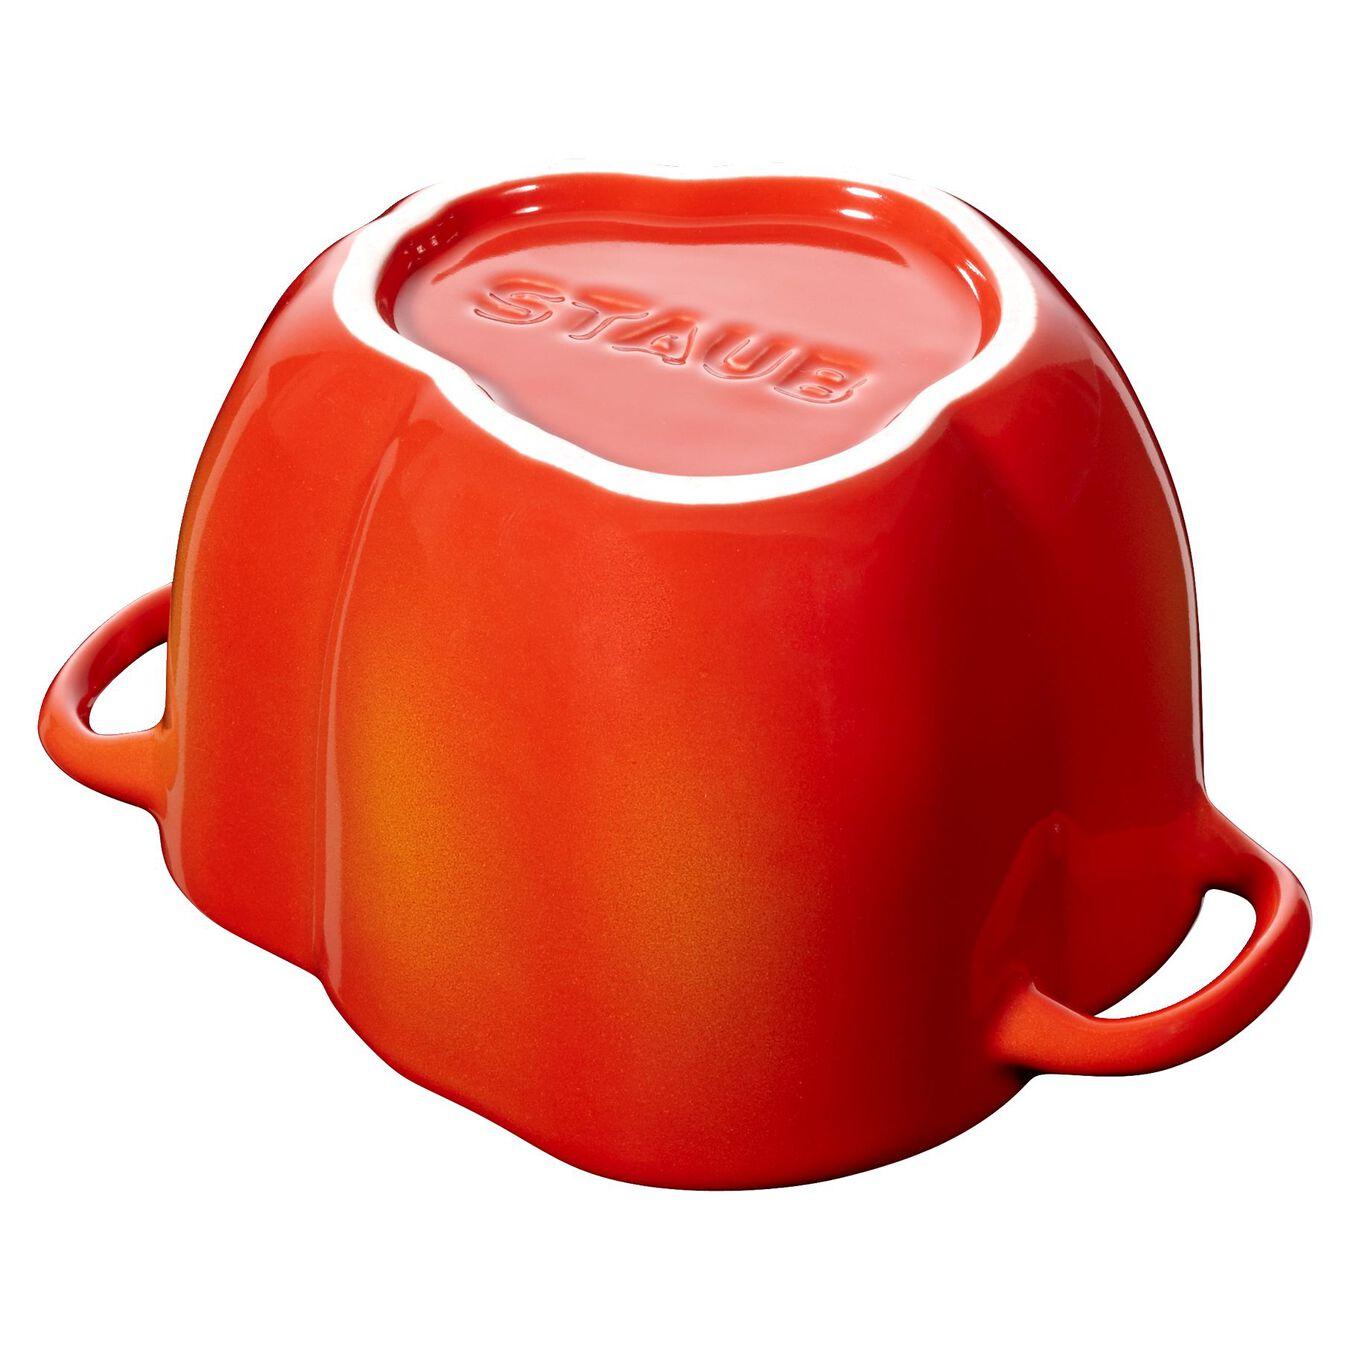 Seramik kap | Seramik | 450 ml | Portakal Kırmızısı,,large 6